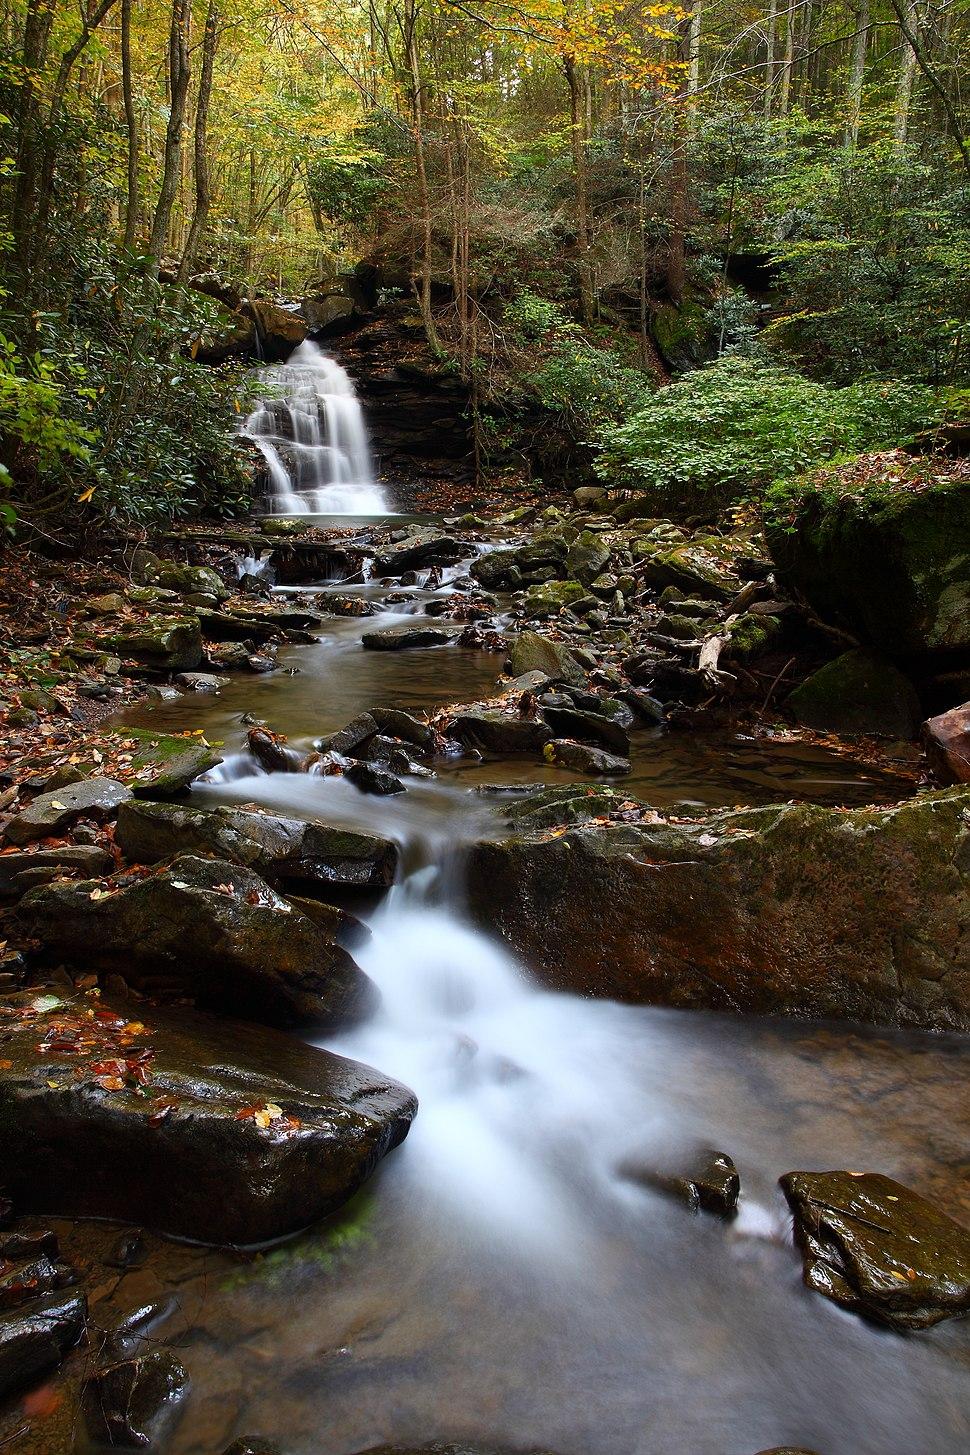 Keeny-creek-wv-autumn-waterfall-scenery - West Virginia - ForestWander